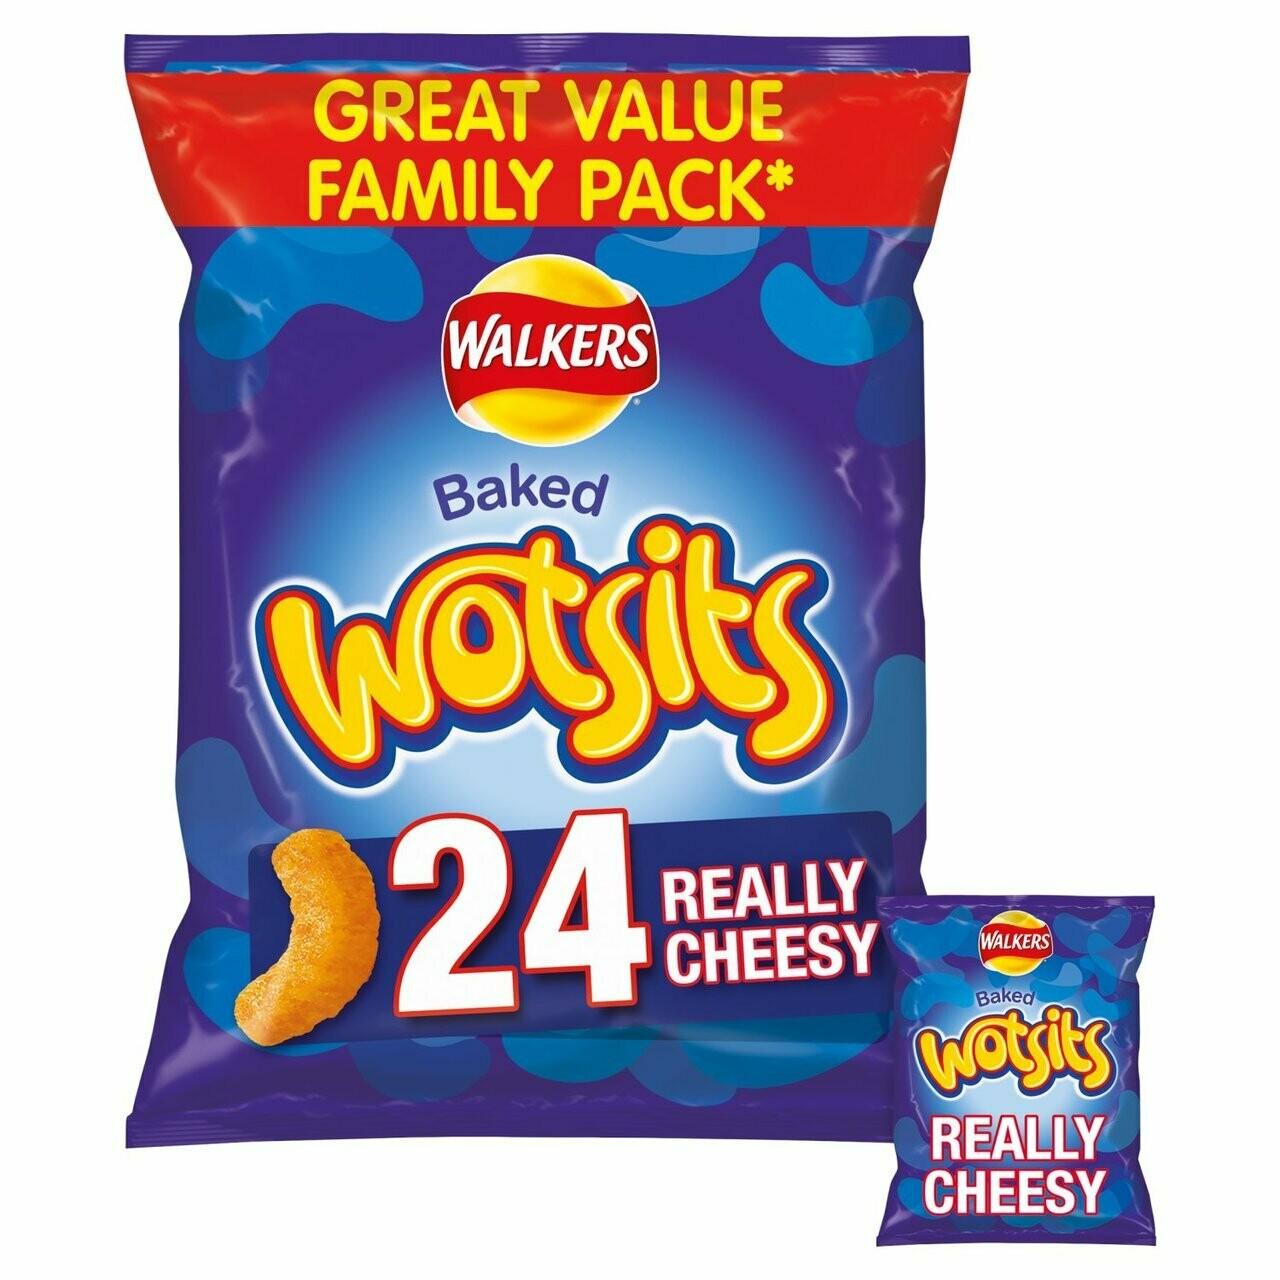 Walkers Wotsits Really Cheesy Multipack Snacks 16.5g [24 PACK]